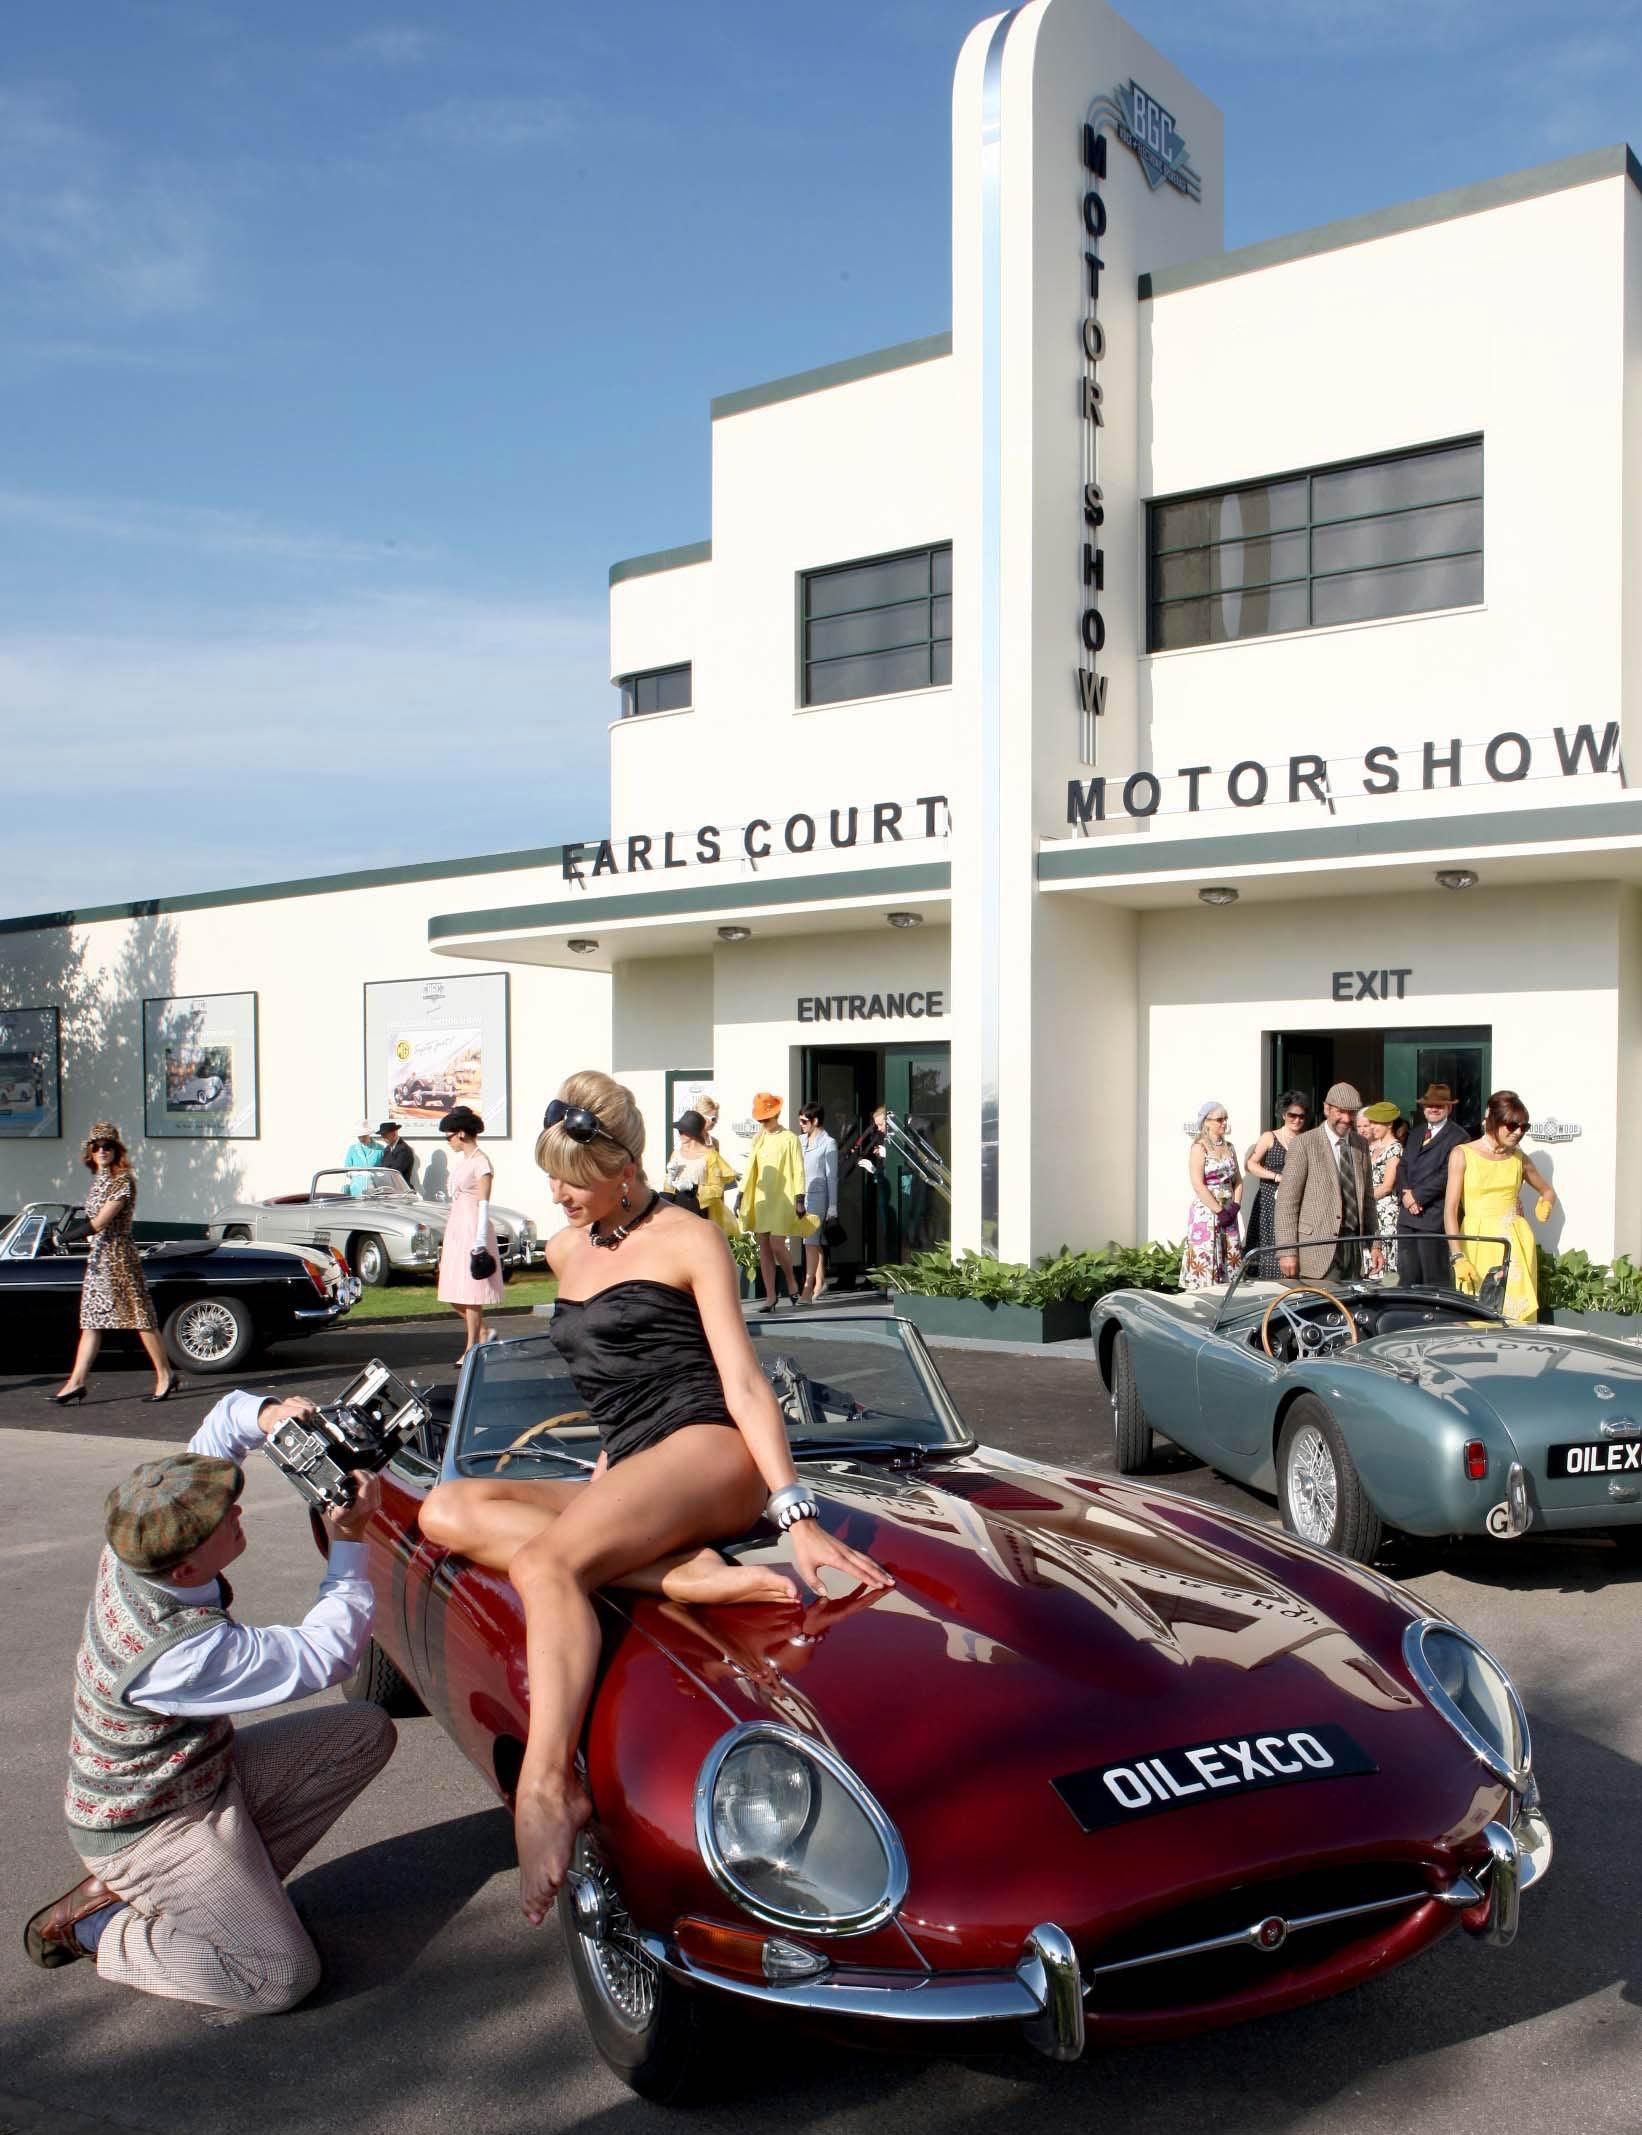 Goodwood Alternative Motor Show